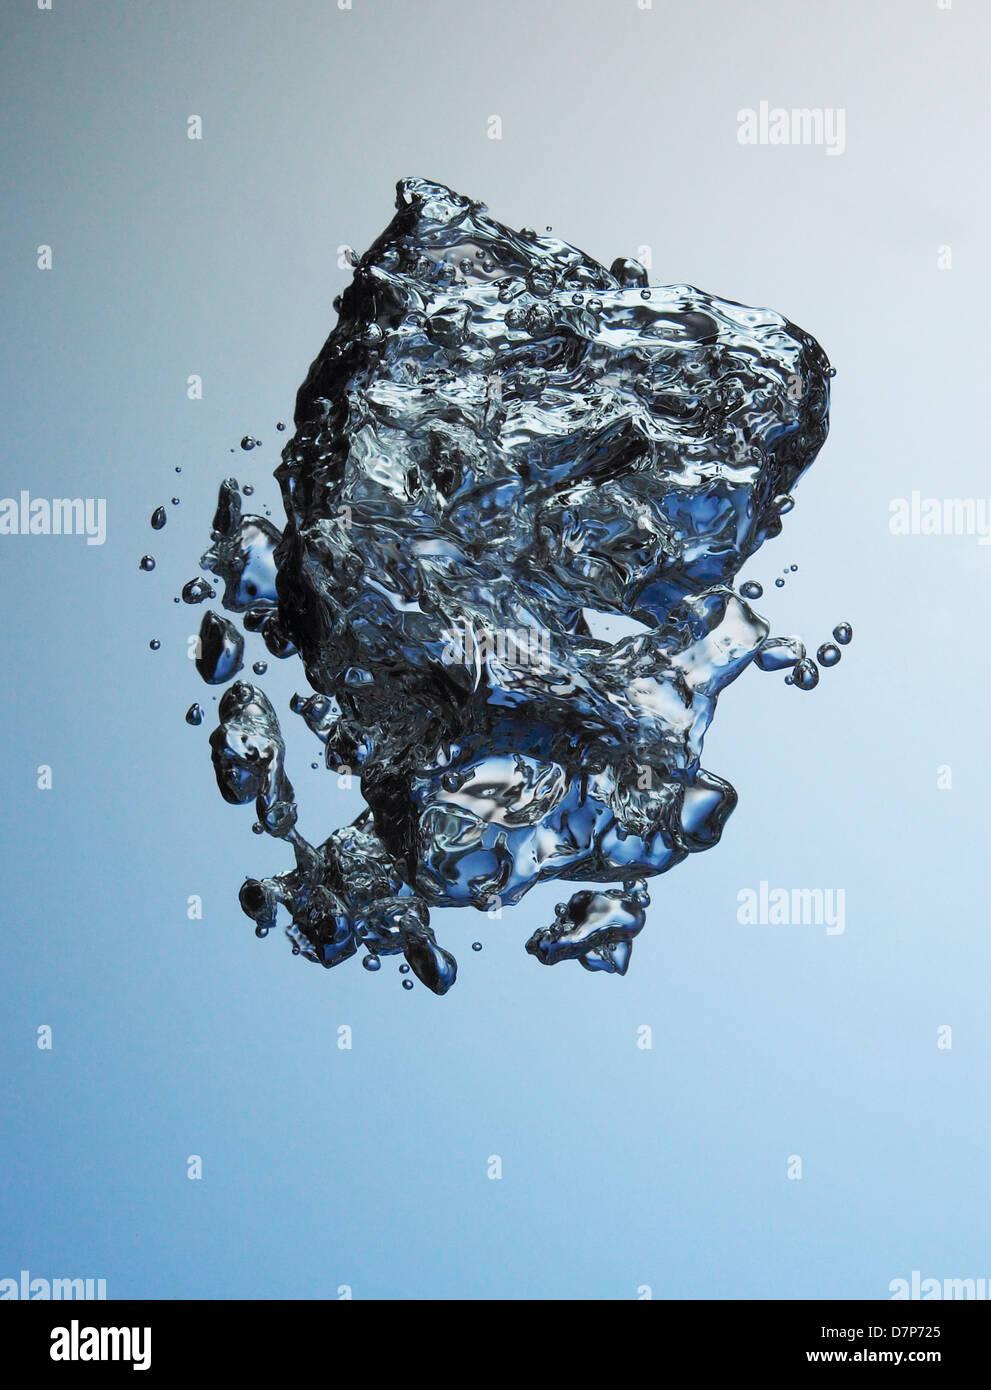 Liquid in Motion - Stock Image